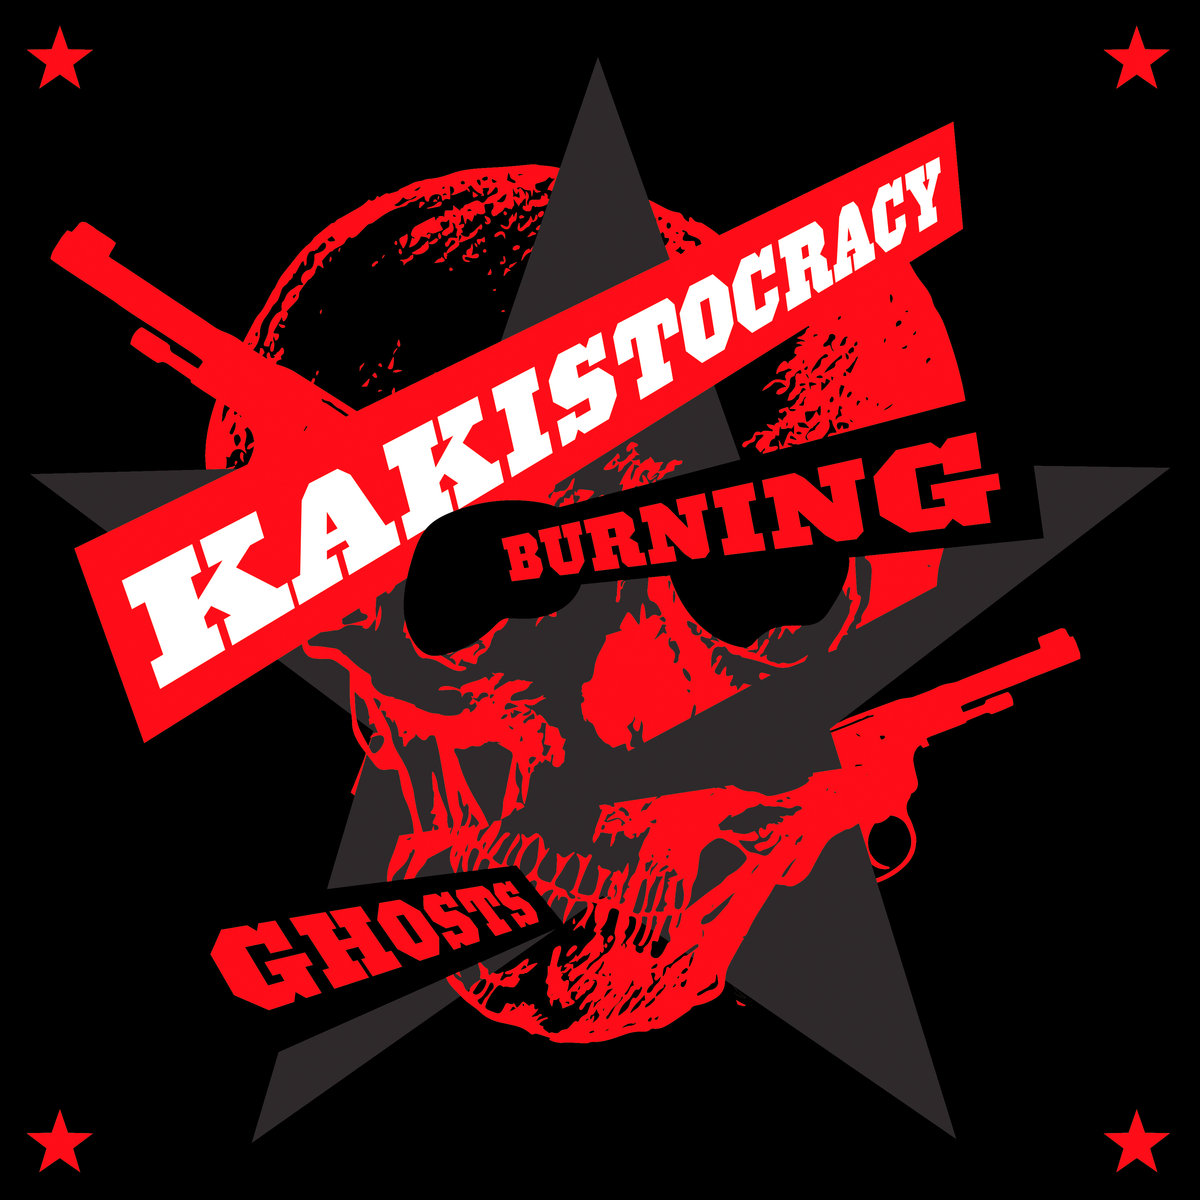 Burning Ghosts // Kakistocracy  (2018) Self-Releaseed EP